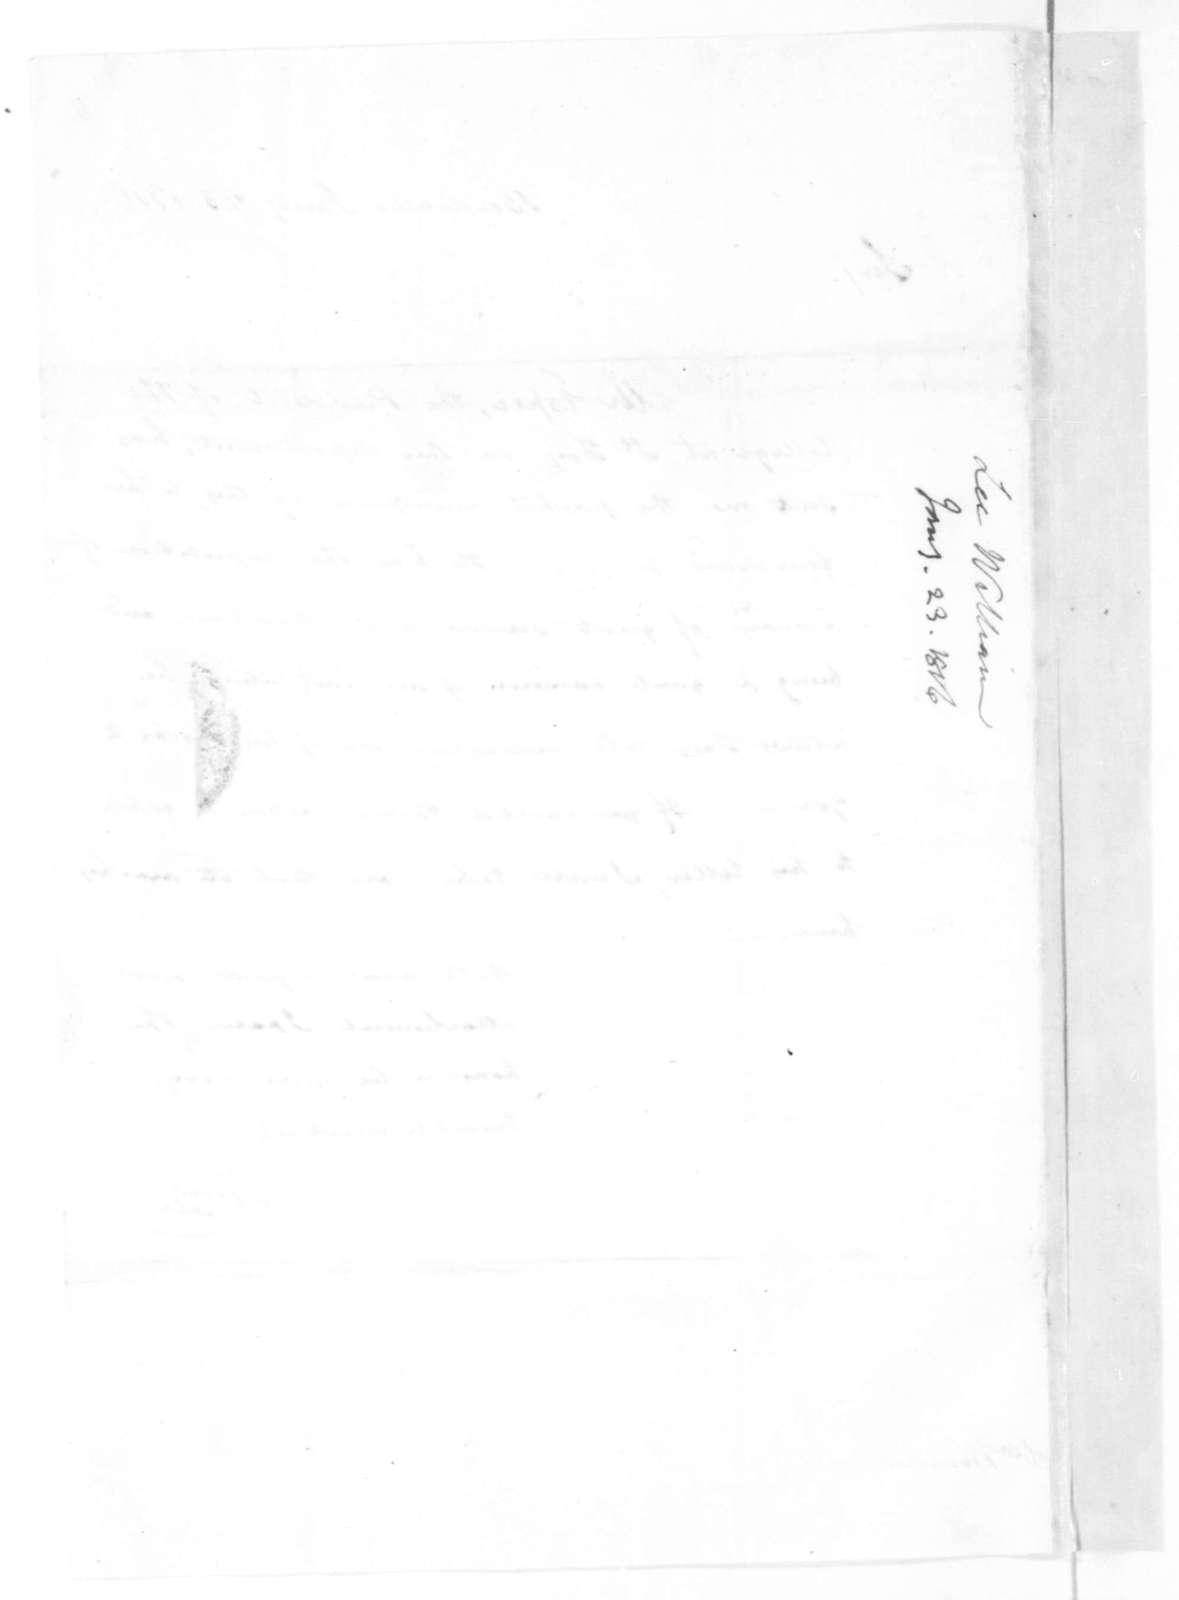 William Lee to James Madison, January 23, 1816.